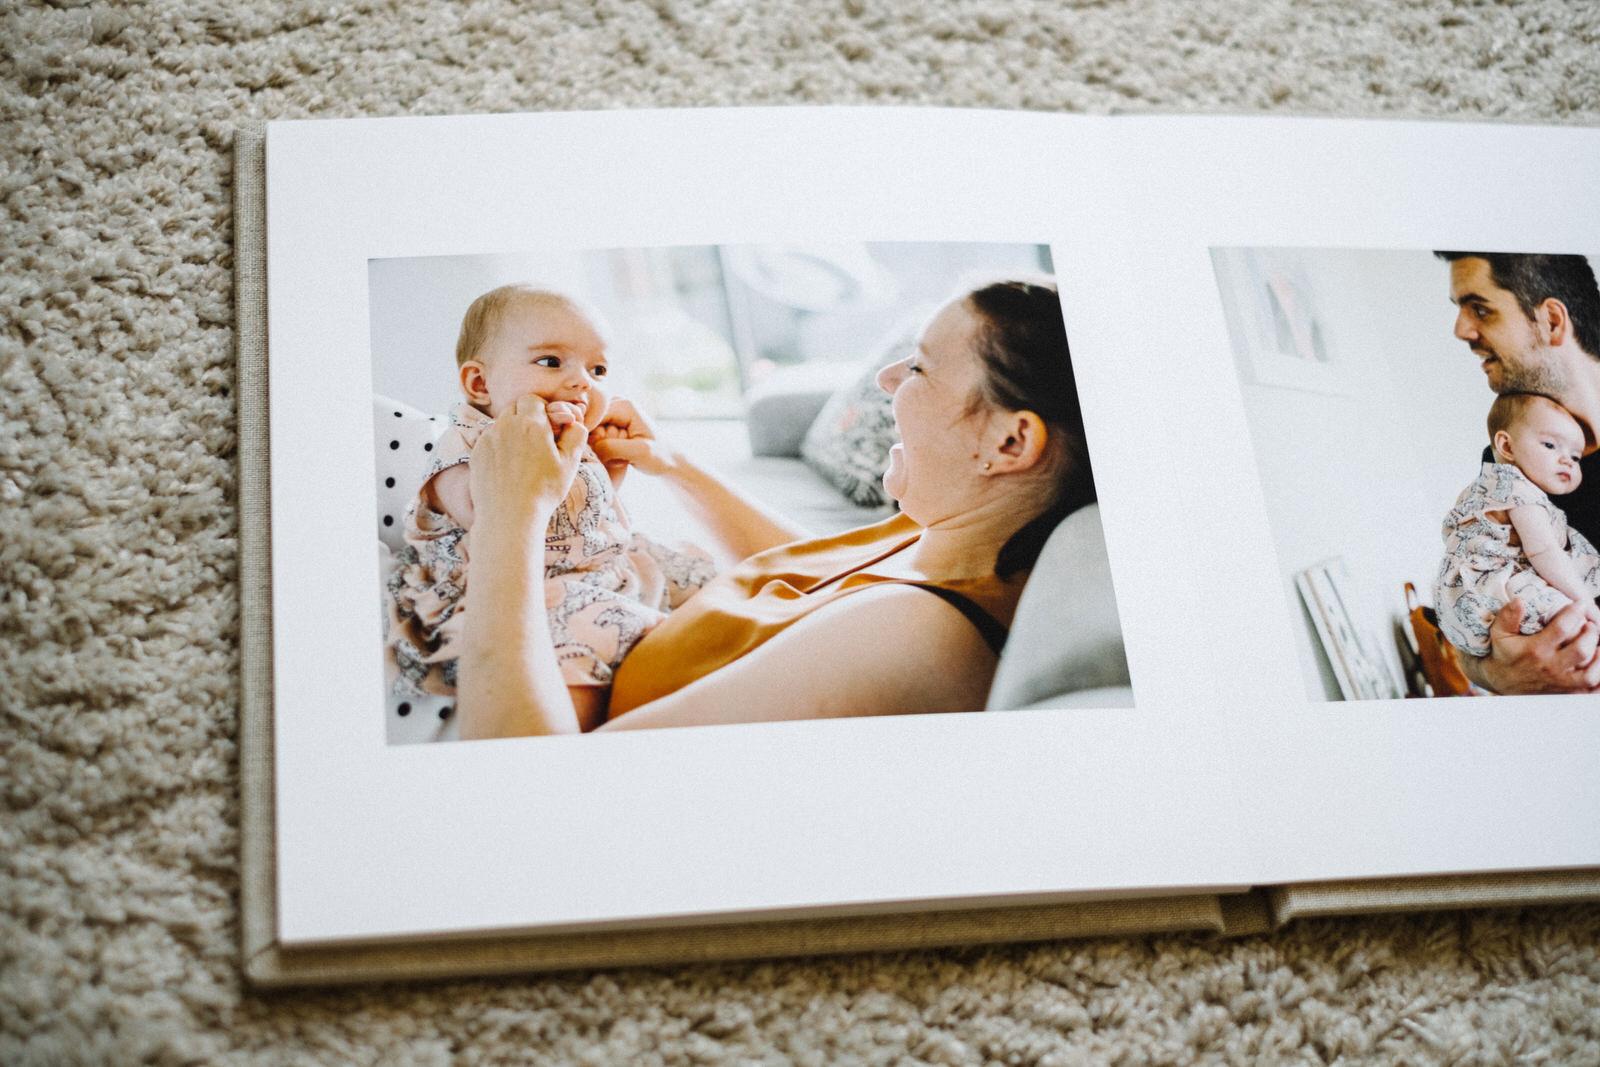 family-story-photos-photo-album-12.jpg